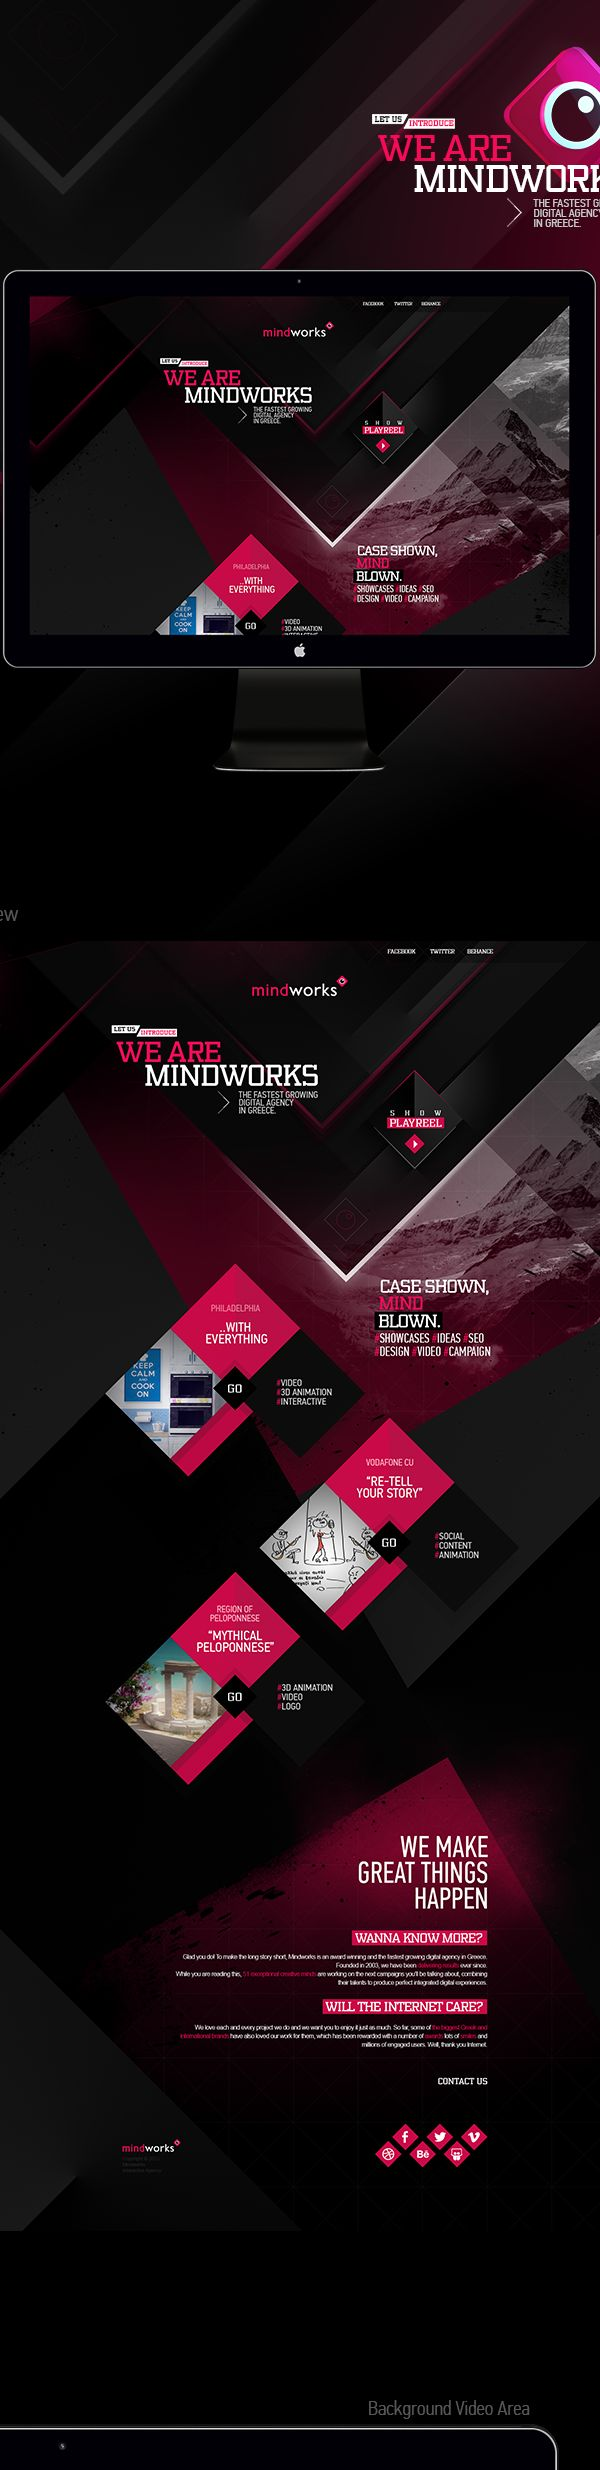 Mindworks New Website by Mike Polizos, via Behance